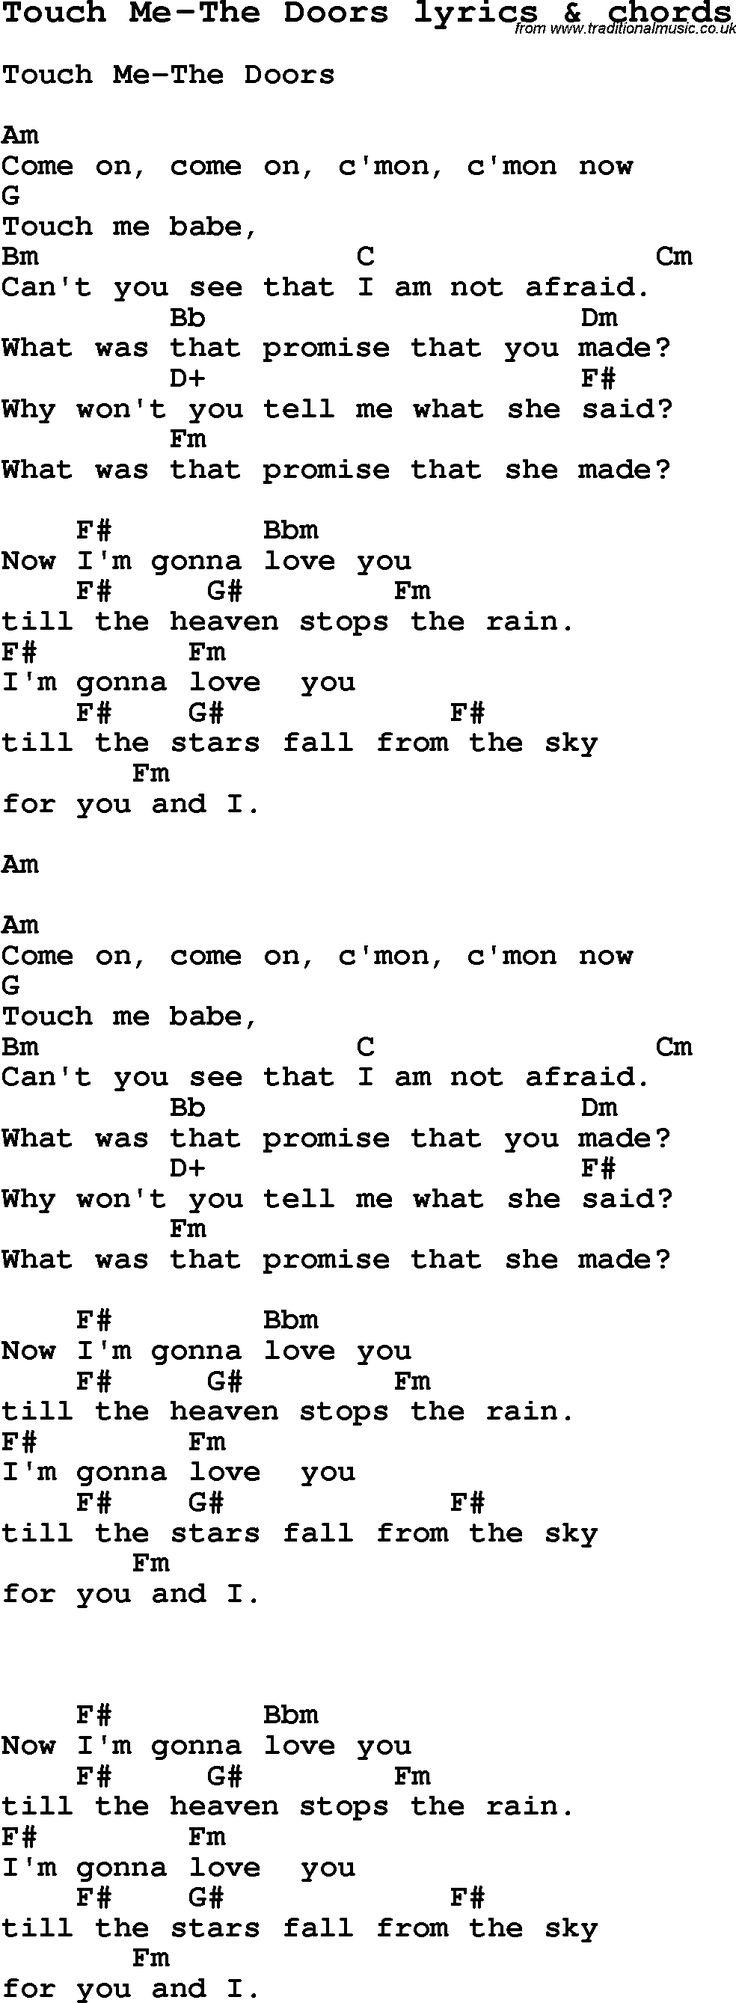 Alabama Doors Chords \\u0026 Door Chords \\\\\\\\\\\\\\\\\\\\\\\\\\\\\\\\u0026 Love Song: Touch Me-The Doors With\\\